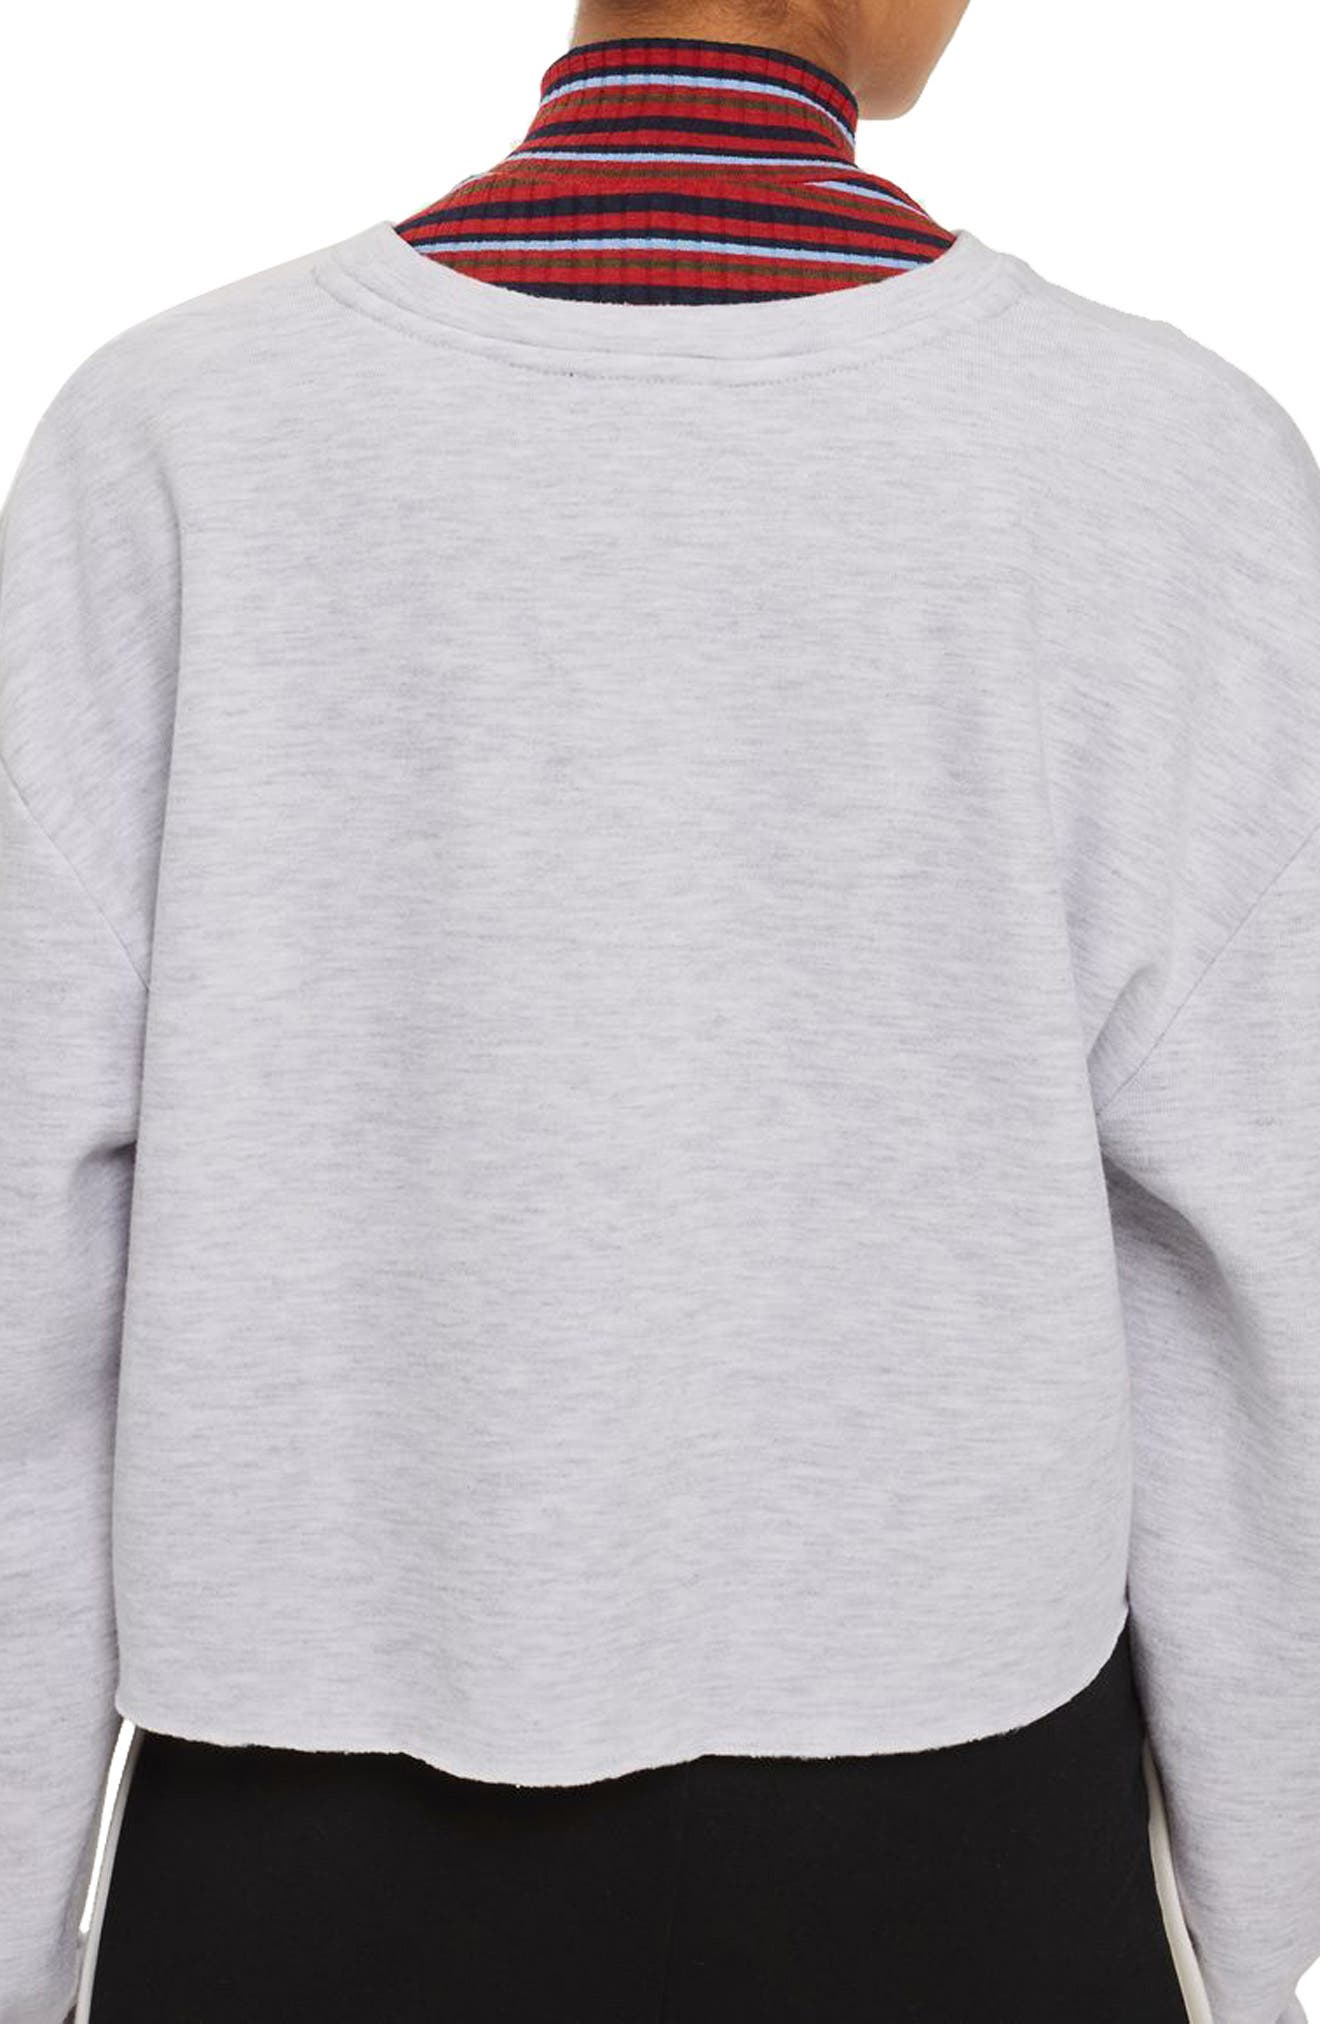 Crop Sweatshirt,                             Alternate thumbnail 2, color,                             GREY MARL